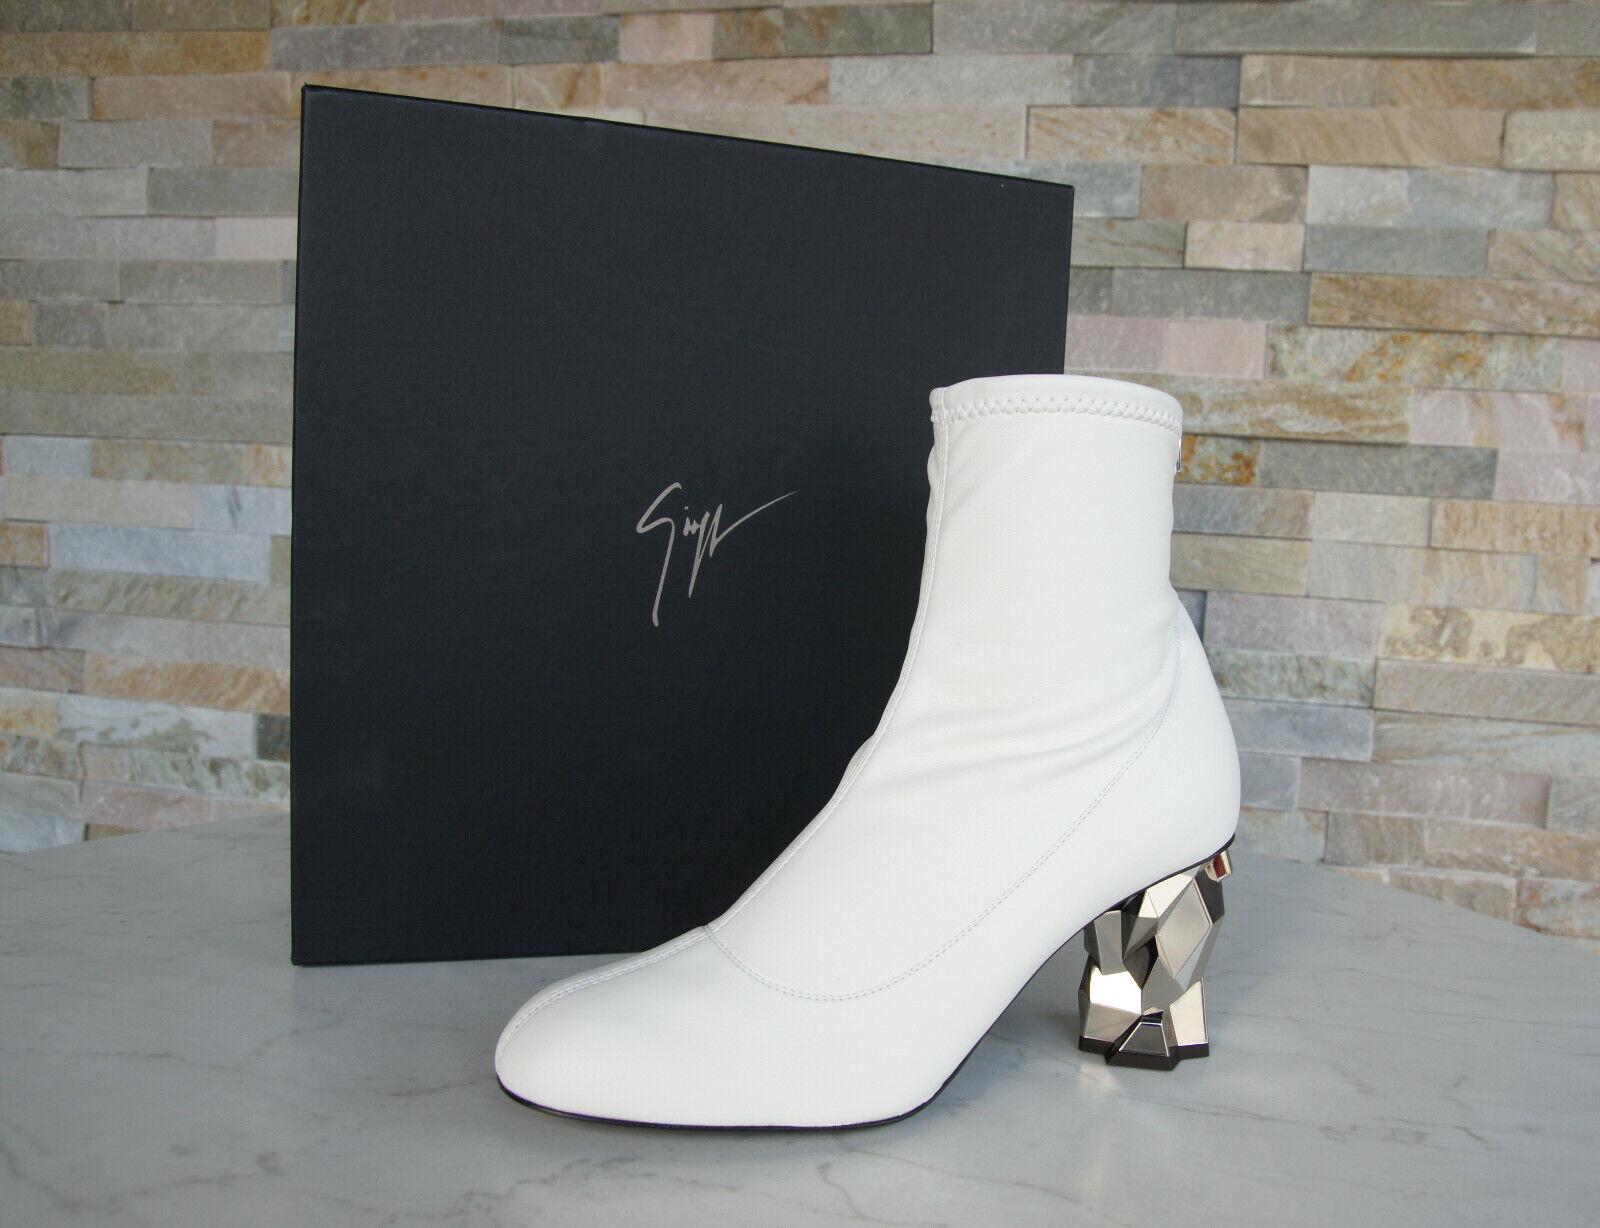 Luxus Giuseppe Zanotti Gr 38 Stiefeletten Stiefelies Schuhe weiss ehem